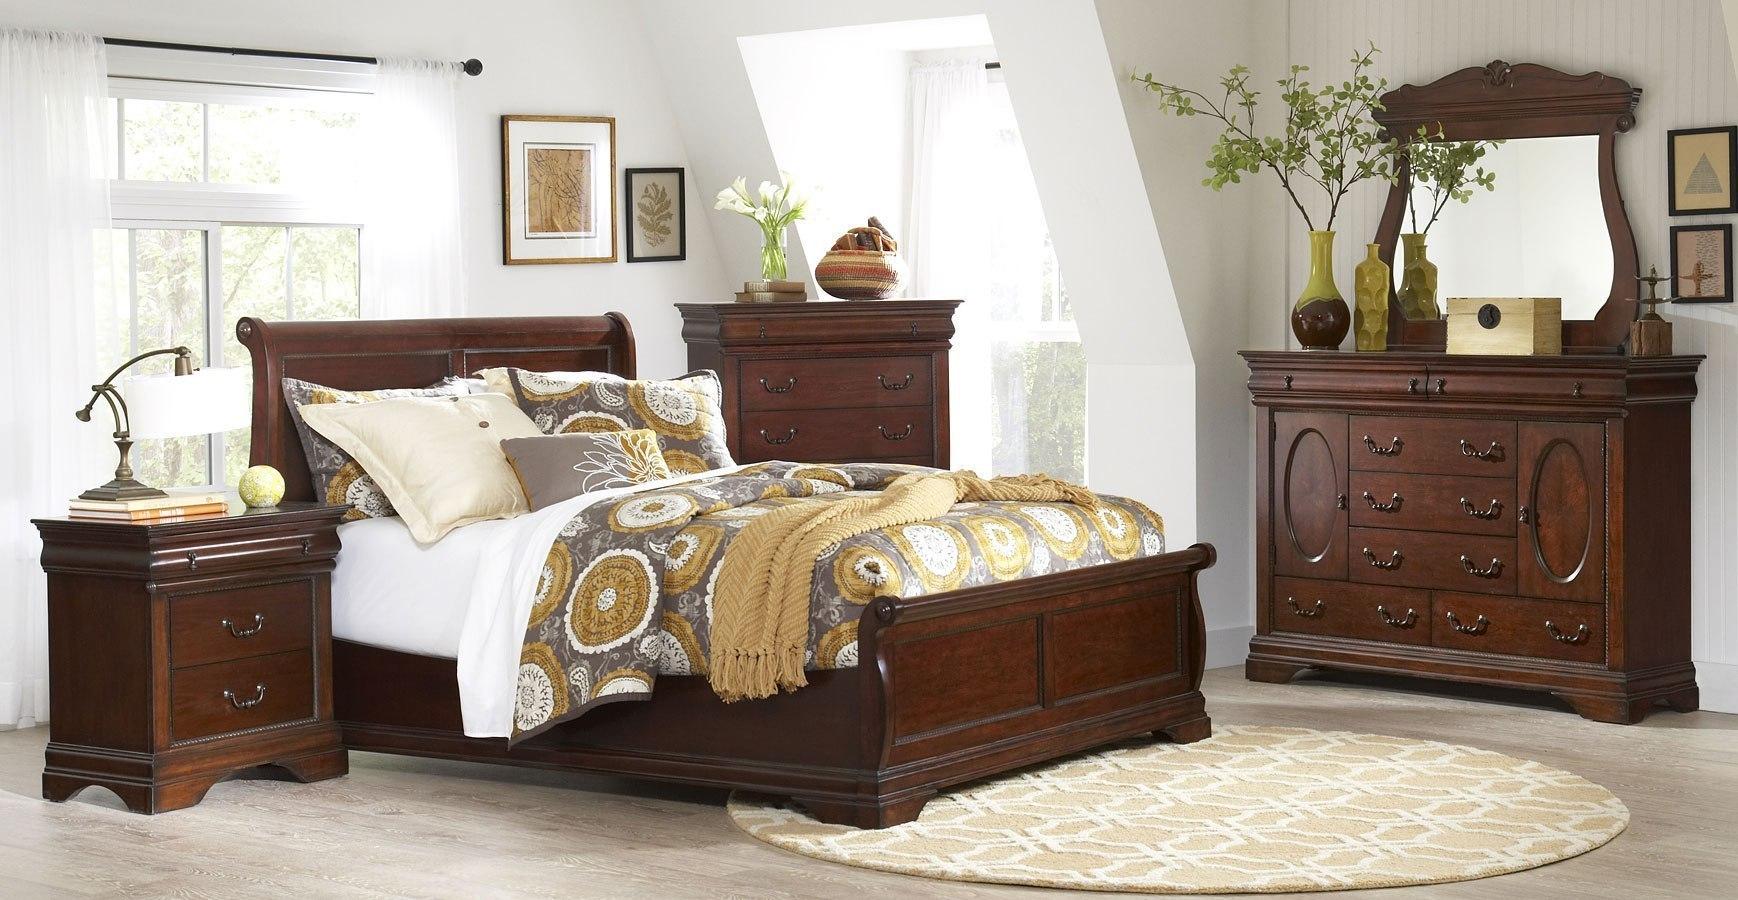 Phenomenal Chateau Low Profile Bedroom Set Download Free Architecture Designs Itiscsunscenecom